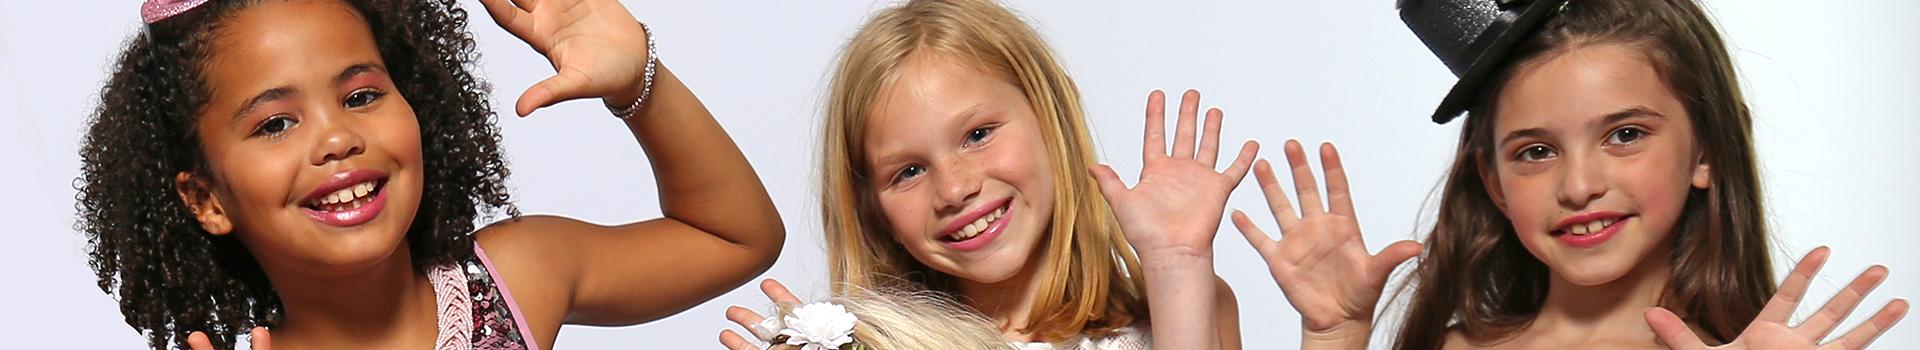 kinderfeestje fotomodel voor meisjes en tieners met beauty en make-up party